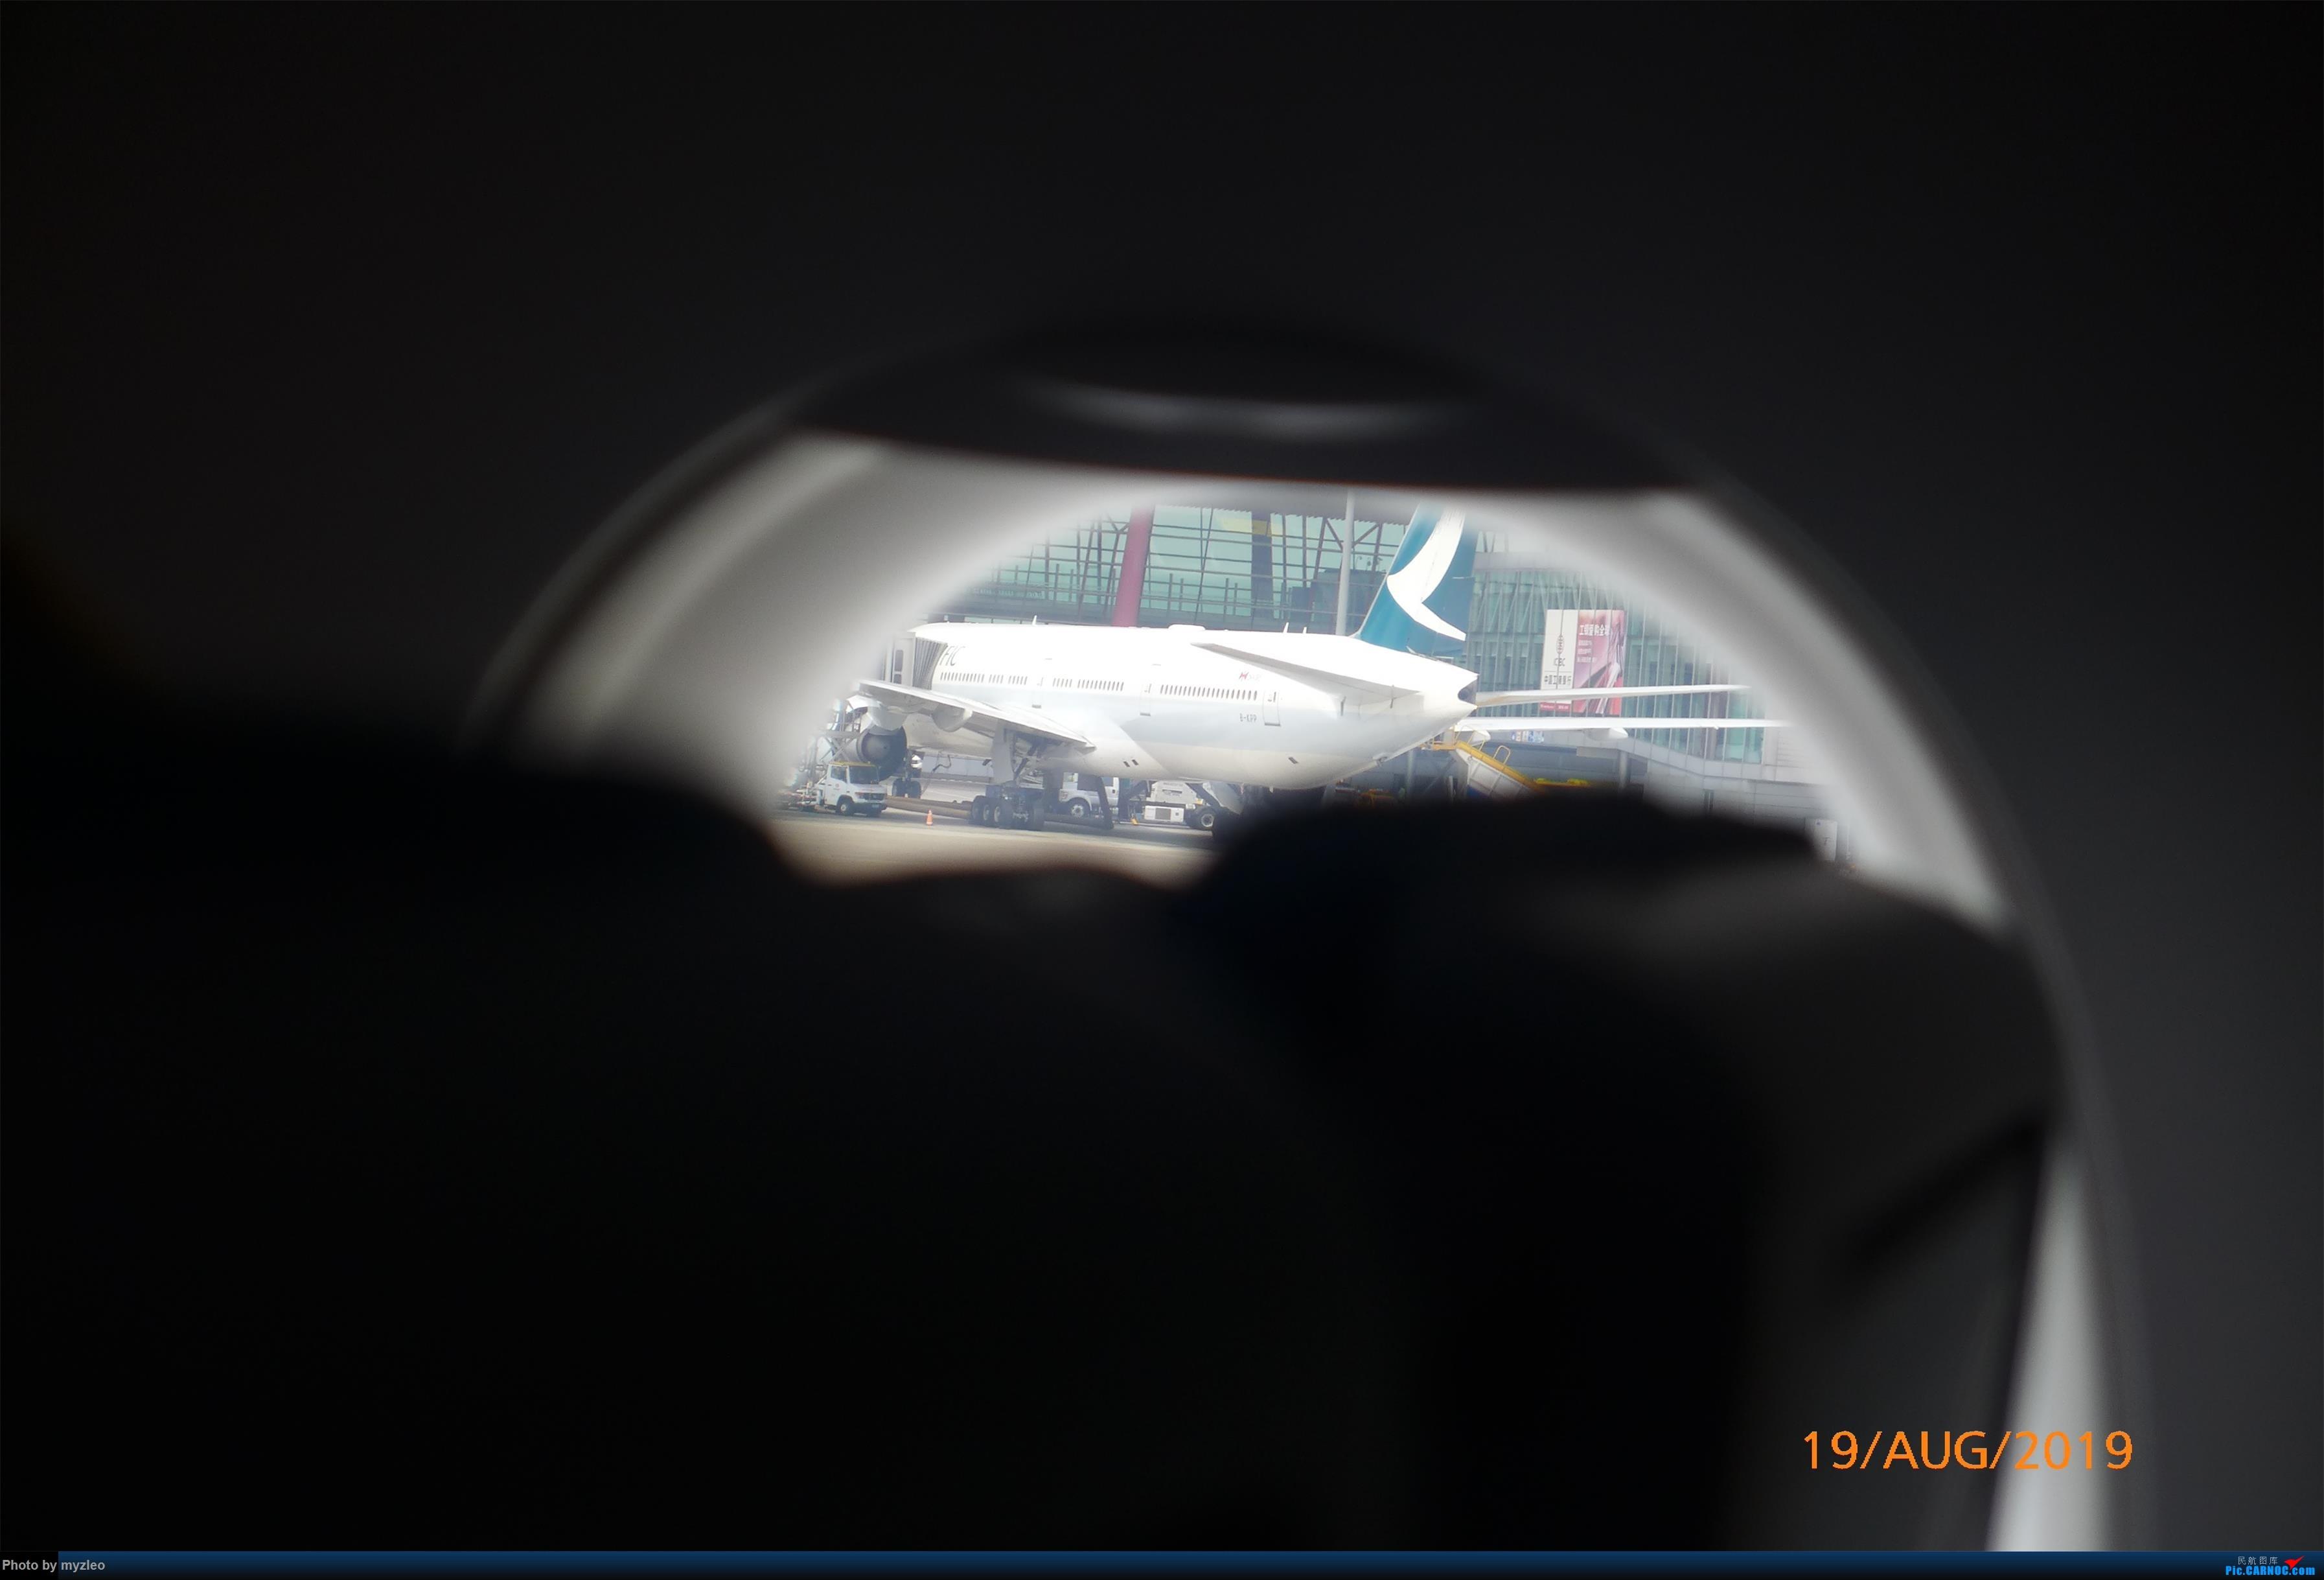 Re:[原创]【myzleo的游记5.1】梦圆一九(1)首搭国航359,北京城里到处走 BOEING 777-300ER B-KPP 中国北京首都国际机场